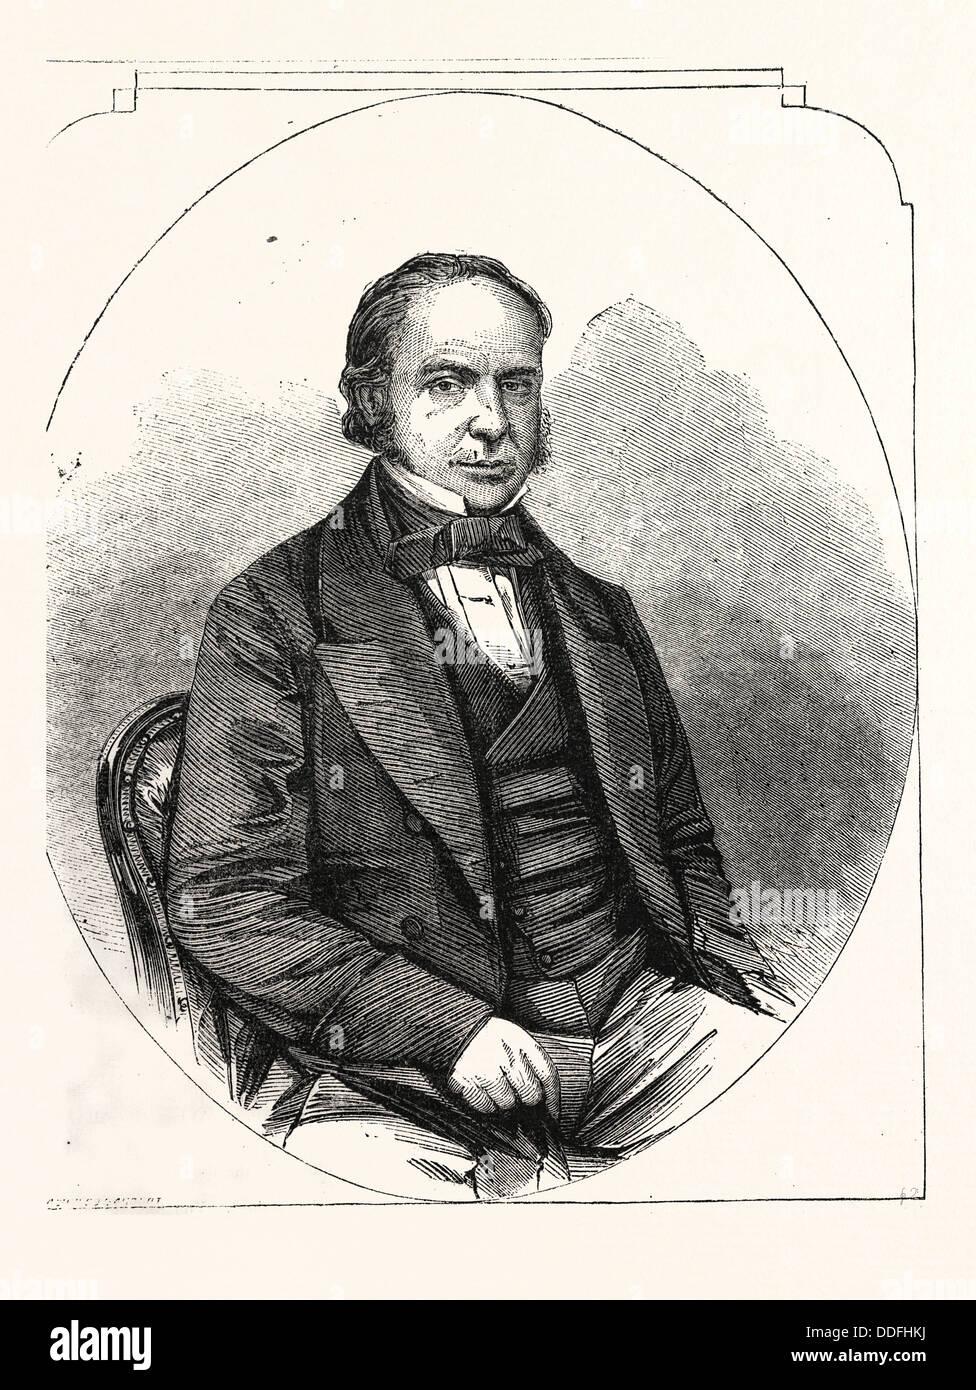 ISAMBARD KINGDOM BRUNEL, 9 April 1806  15 September 1859, was an English mechanical and civil engineer. UK, britain, - Stock Image